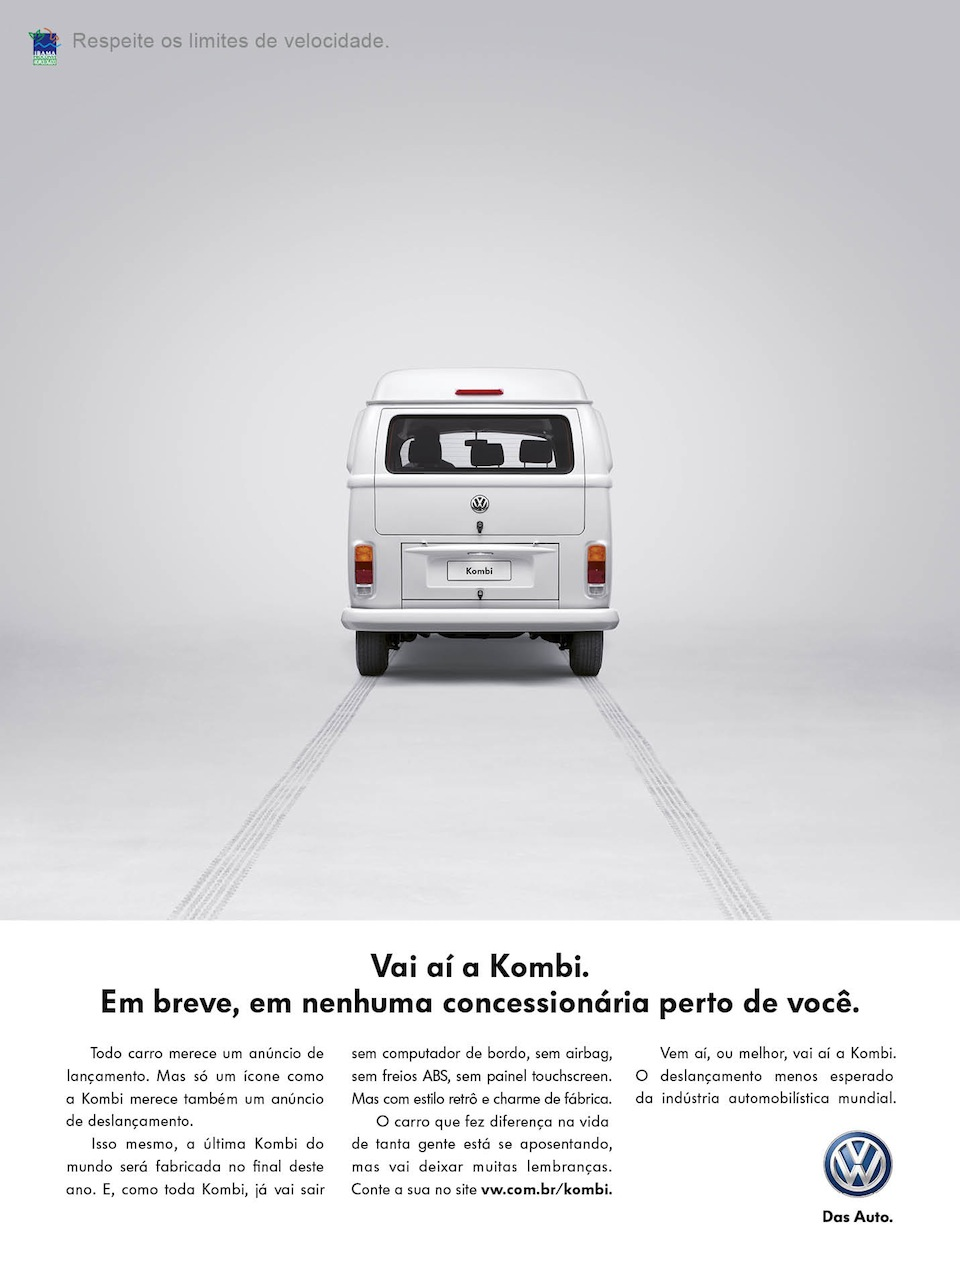 kombi_deslancamento